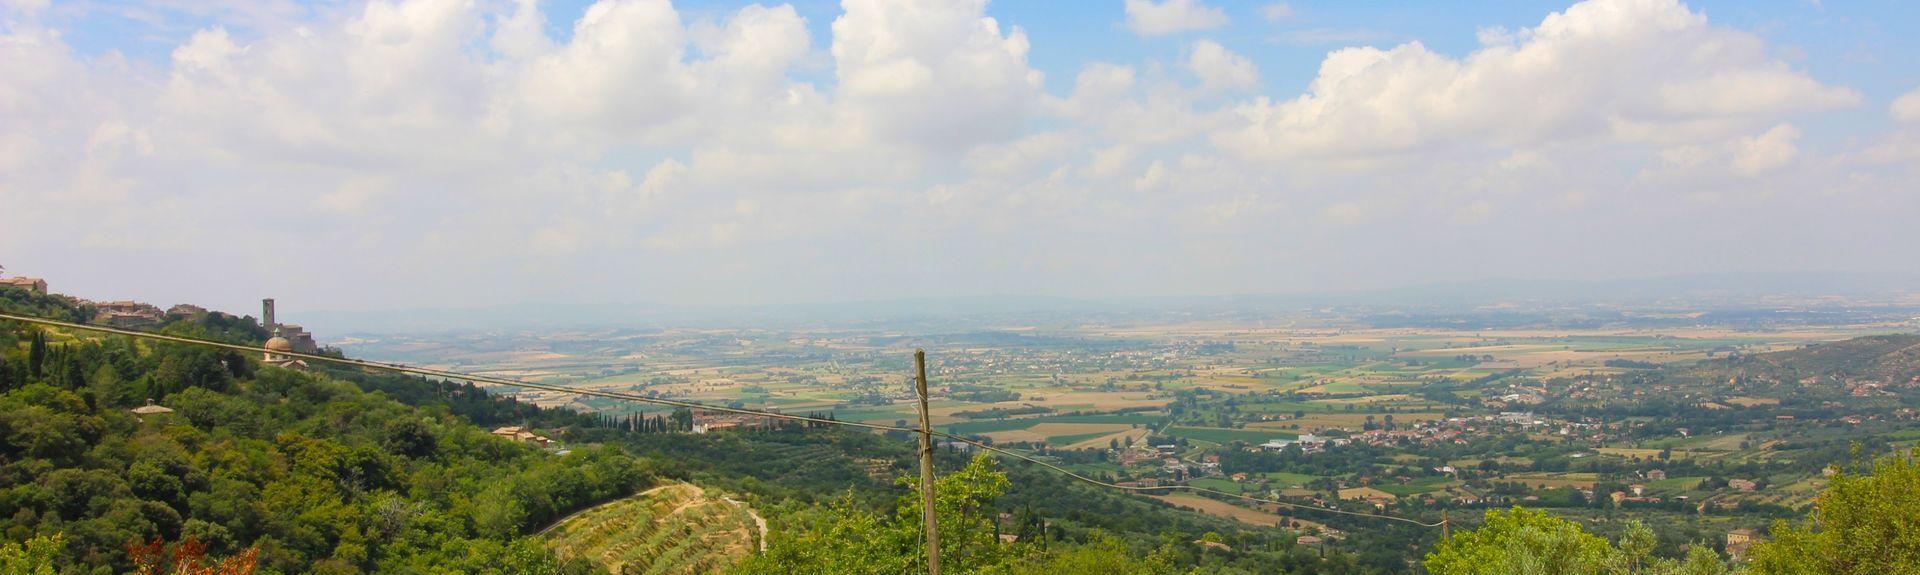 Province of Arezzo, Italy